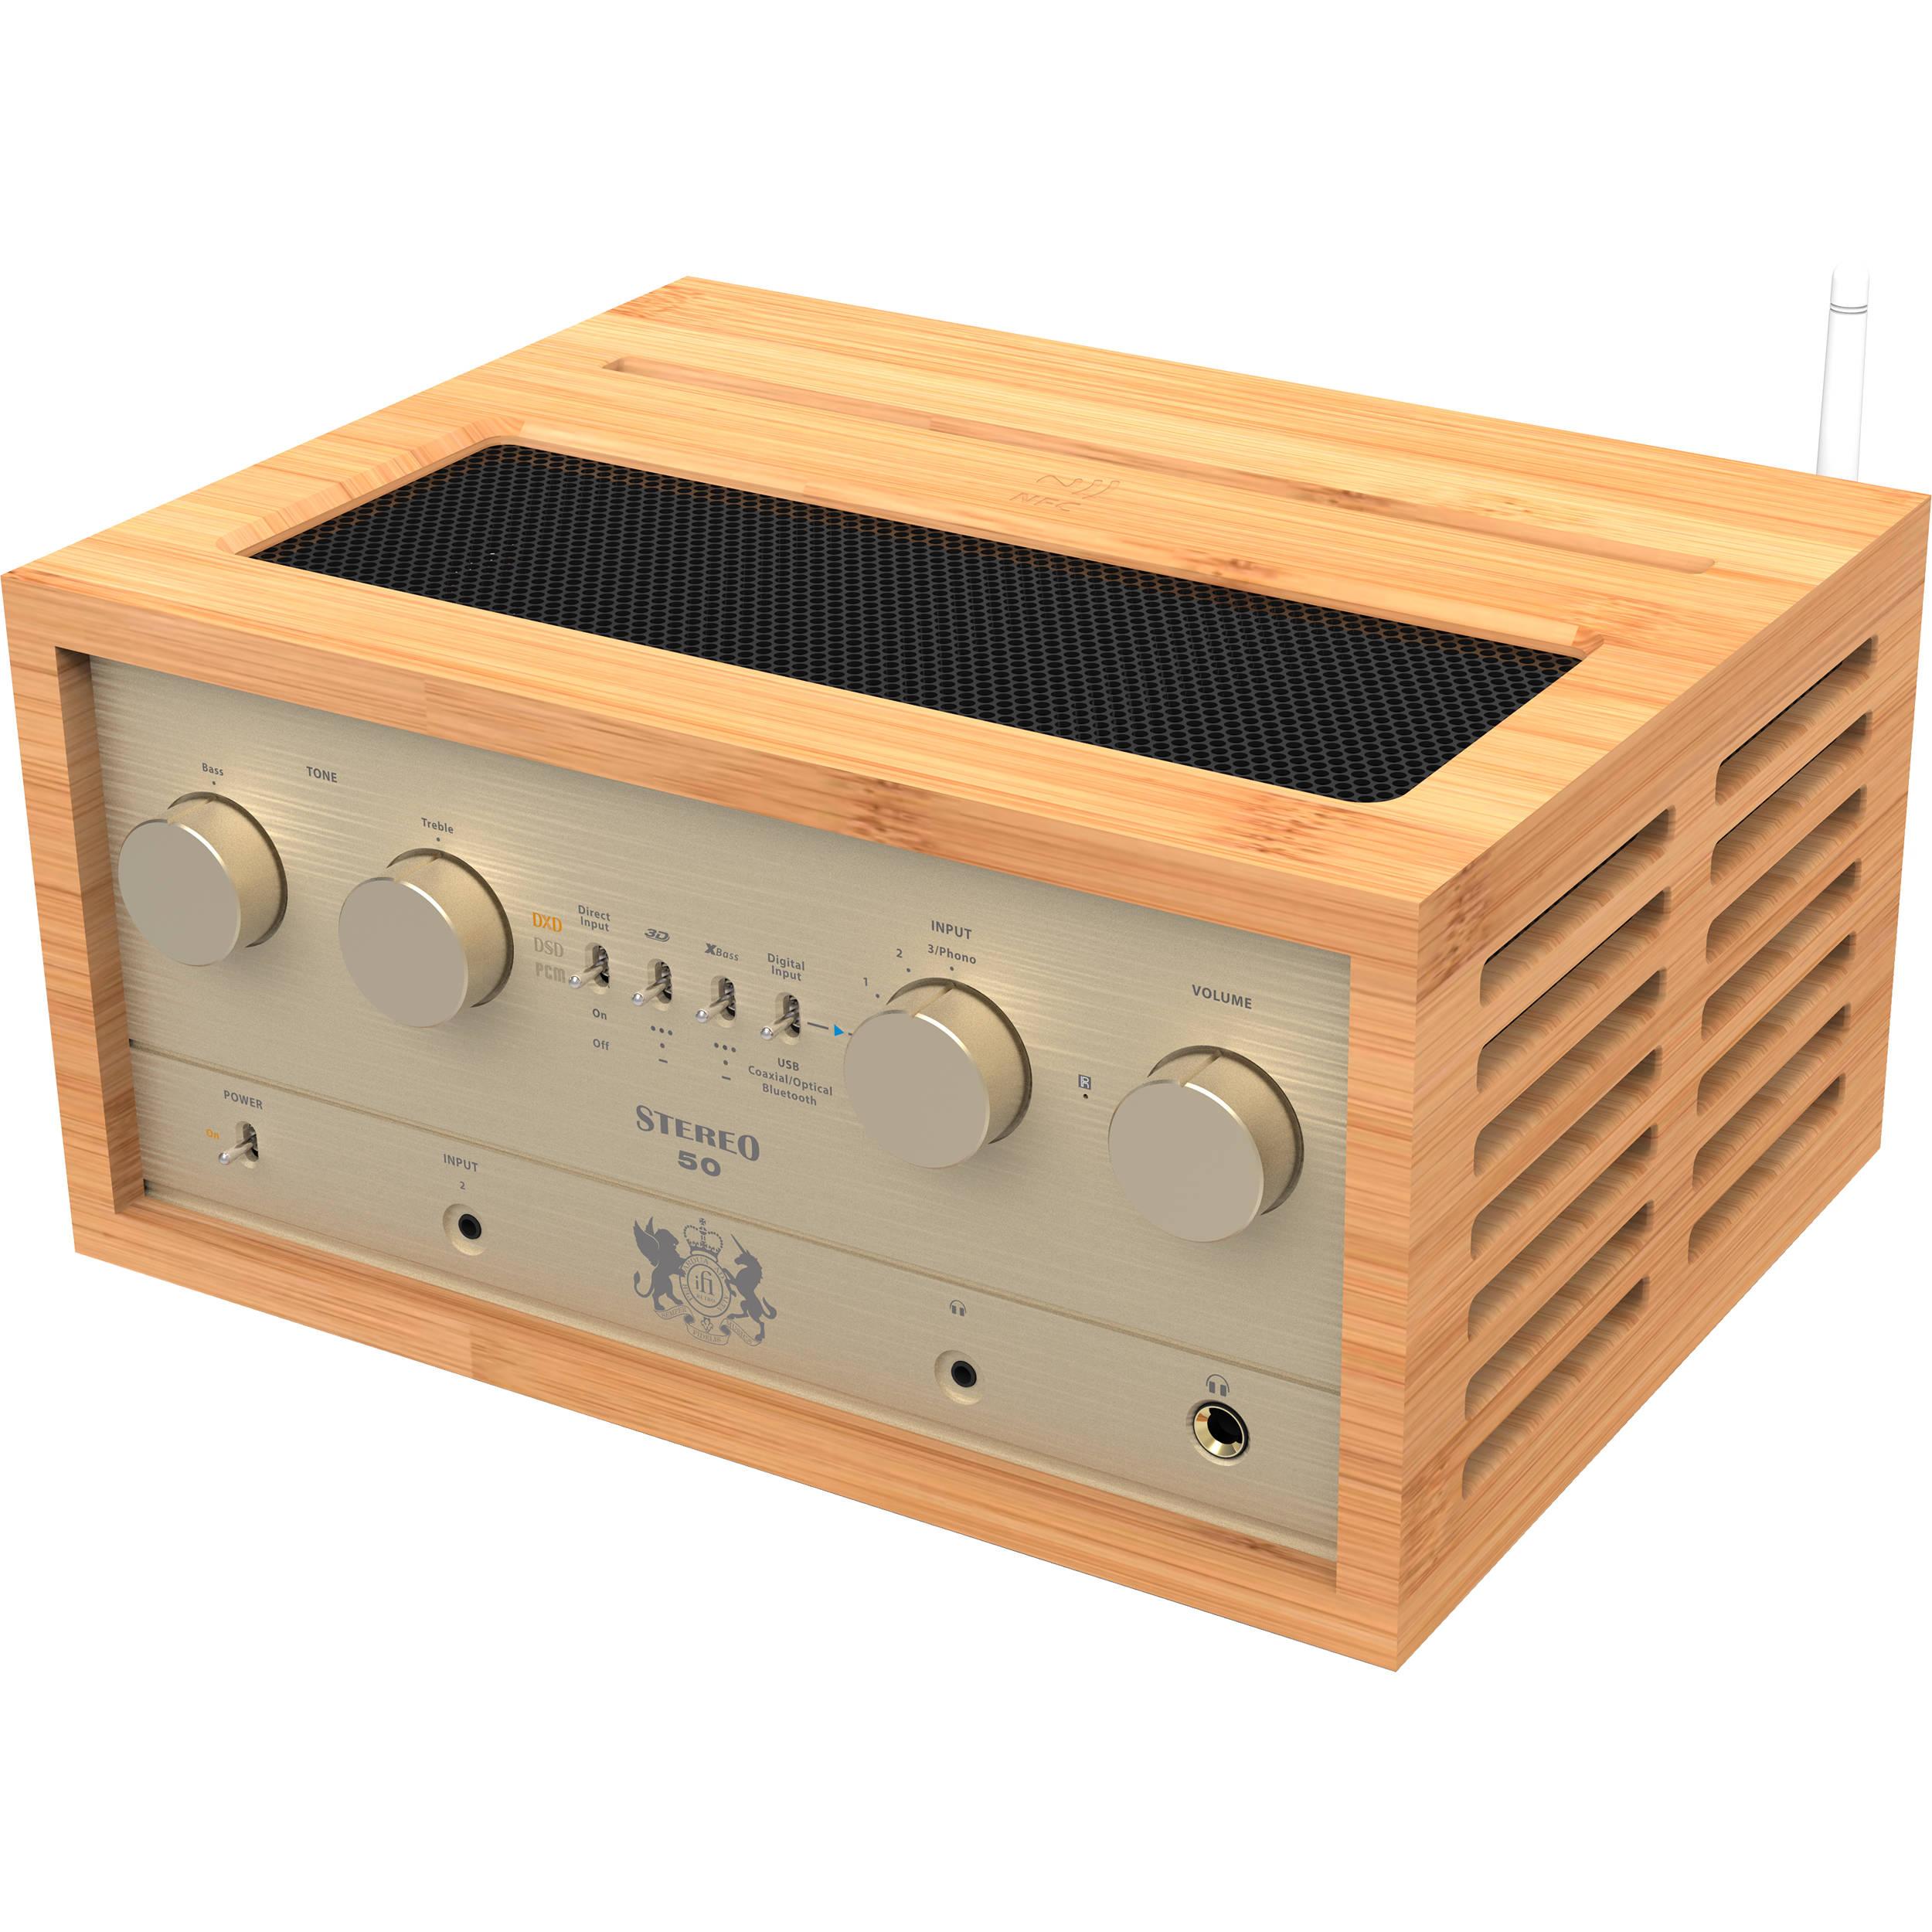 Image result for iFi Retro 50 Amp